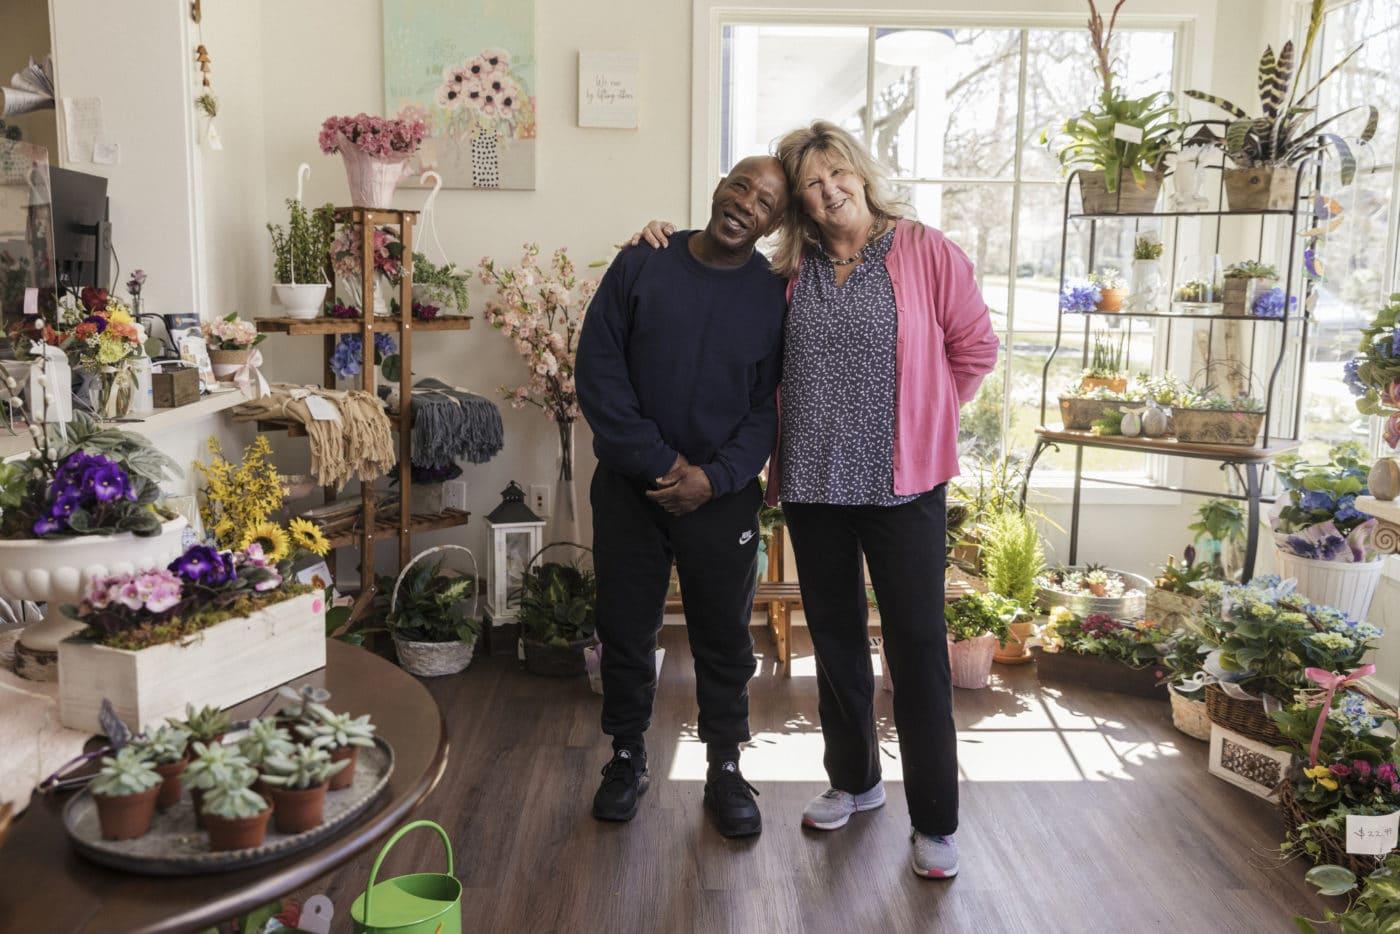 David McDougald and Kathy Angelinovich